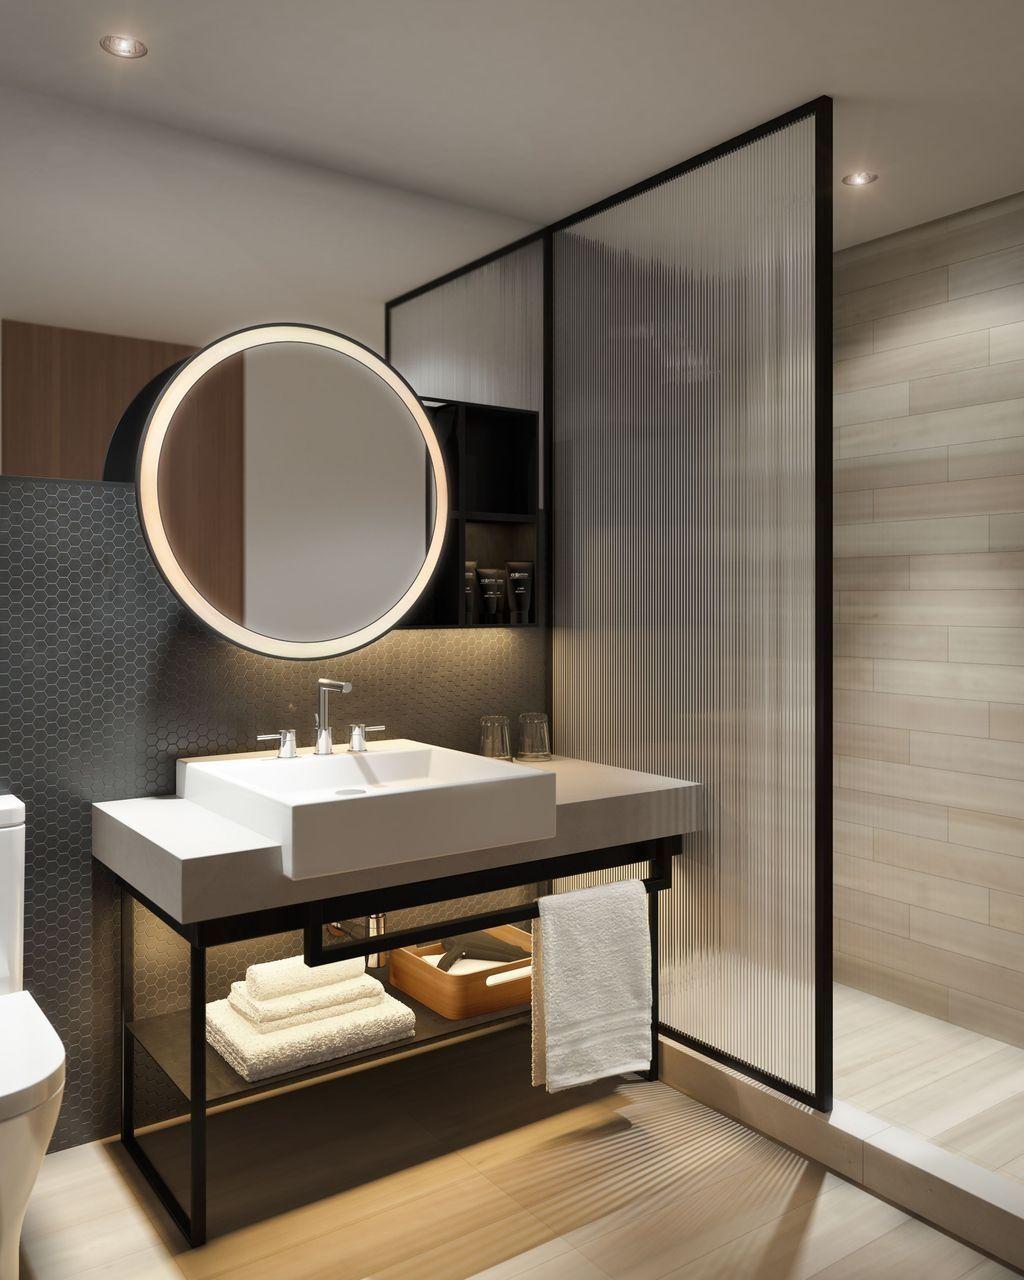 46 Popular Bathroom Mirror Design Ideas For Any Bathroom Model Luxurybathroom3dmodel Bathroom Mirror Design Restroom Decor Bathroom Model Popular bathroom mirror with